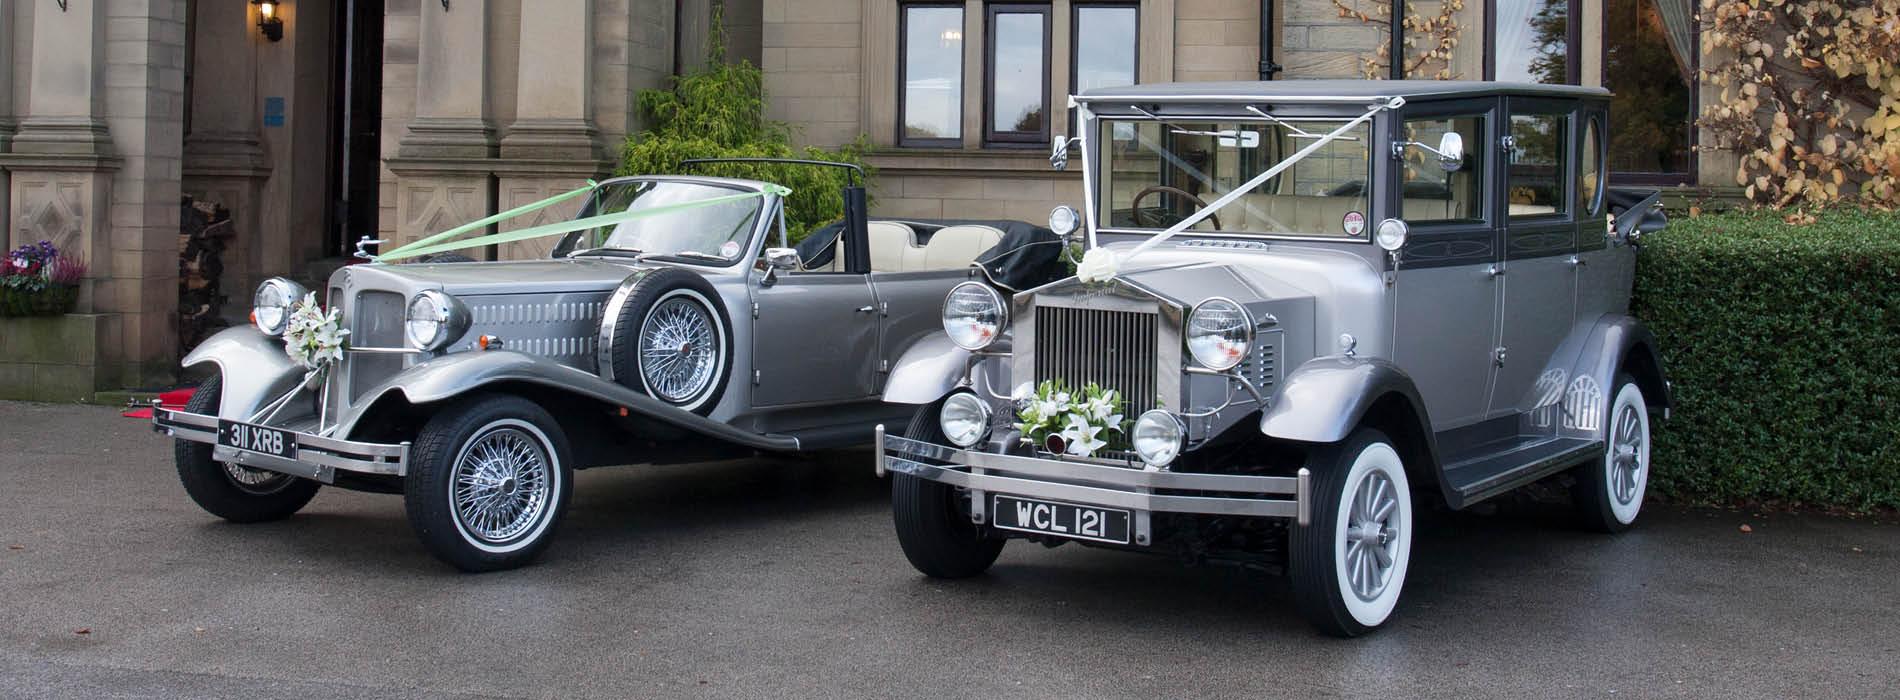 Wedding cars Huddersfield Imperial Beauford